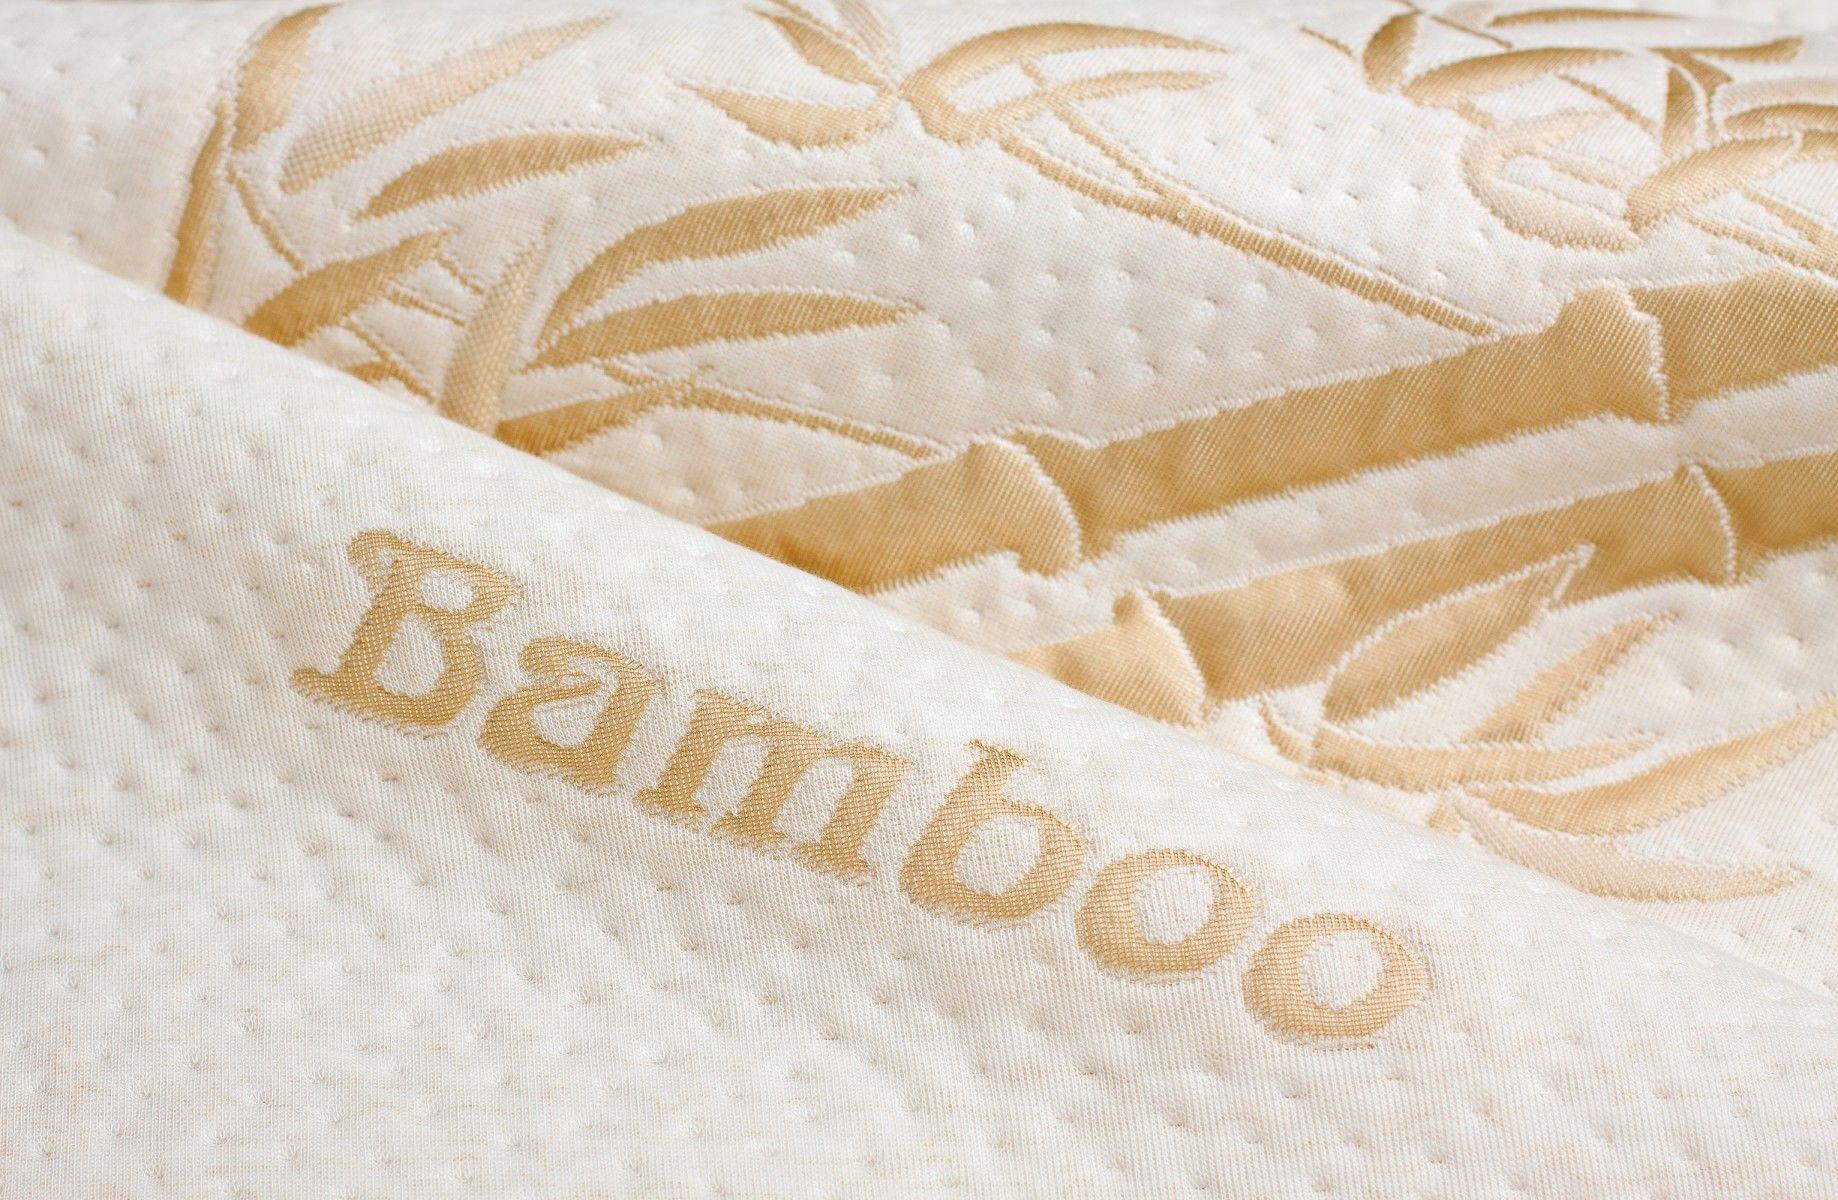 Pokrowiec na materac BAMBO 140x190 - Dostawa Gratis!